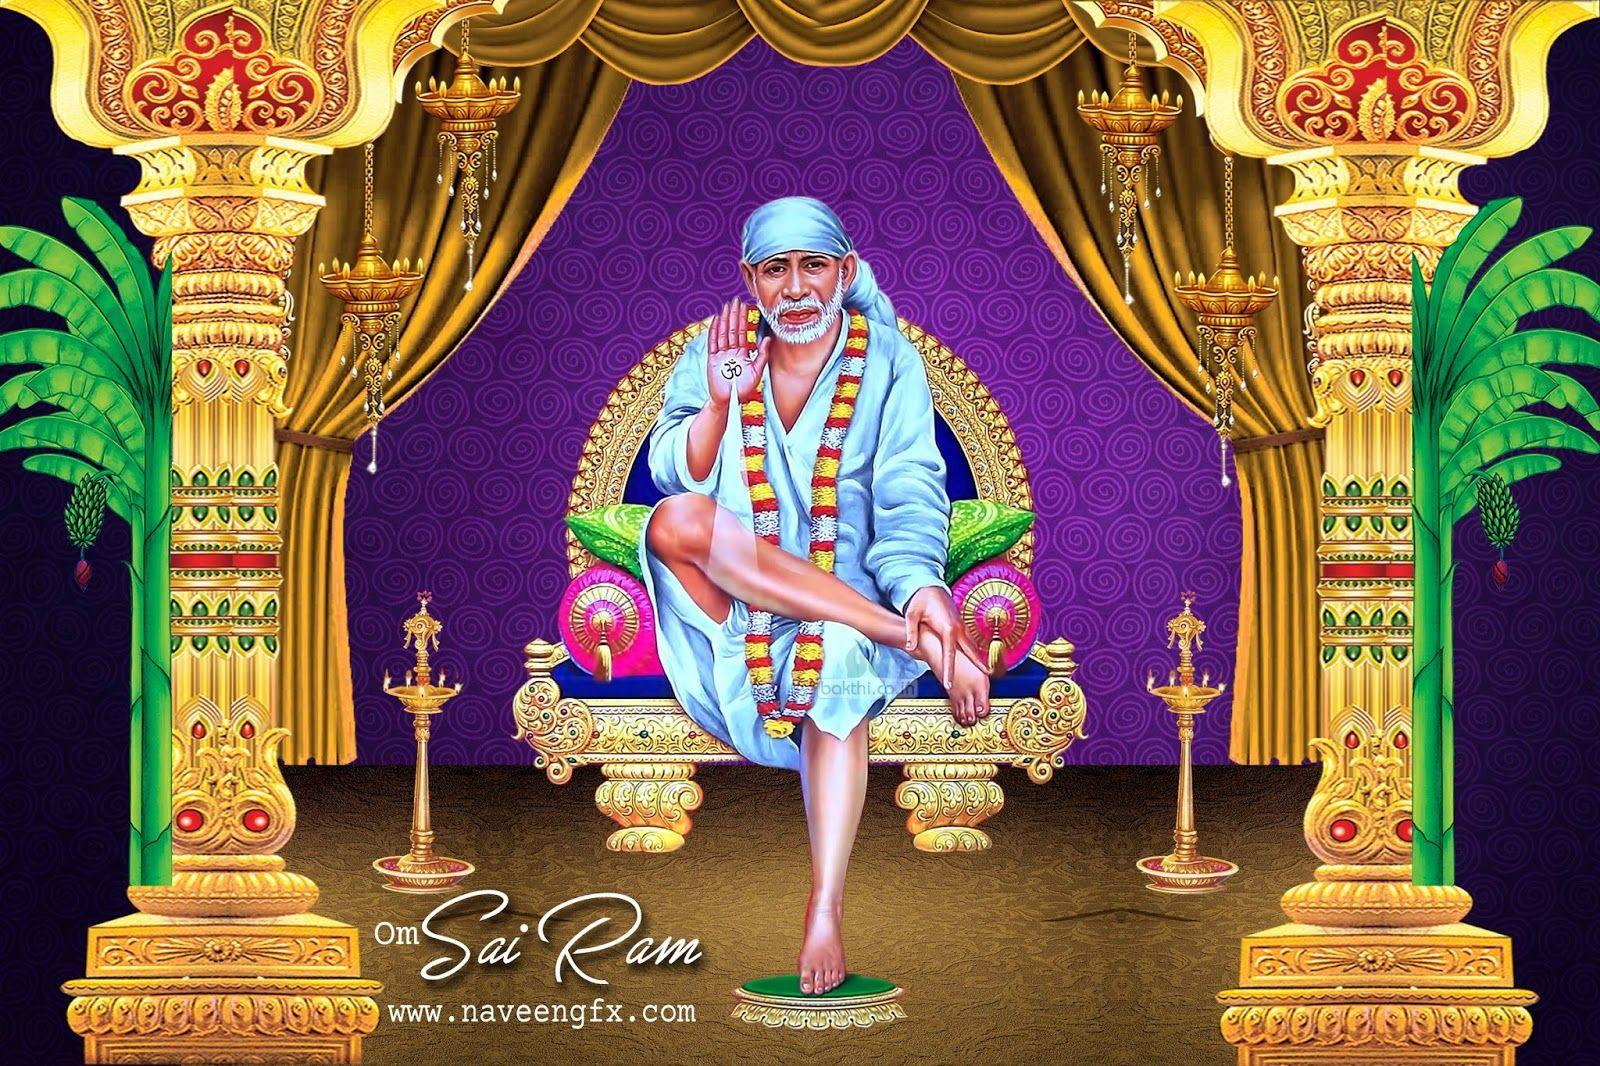 Sai Baba Images High Resolution Images Free Downloads Naveengfx Sai Baba Hd Wallpaper Hd Wallpaper Sai Baba